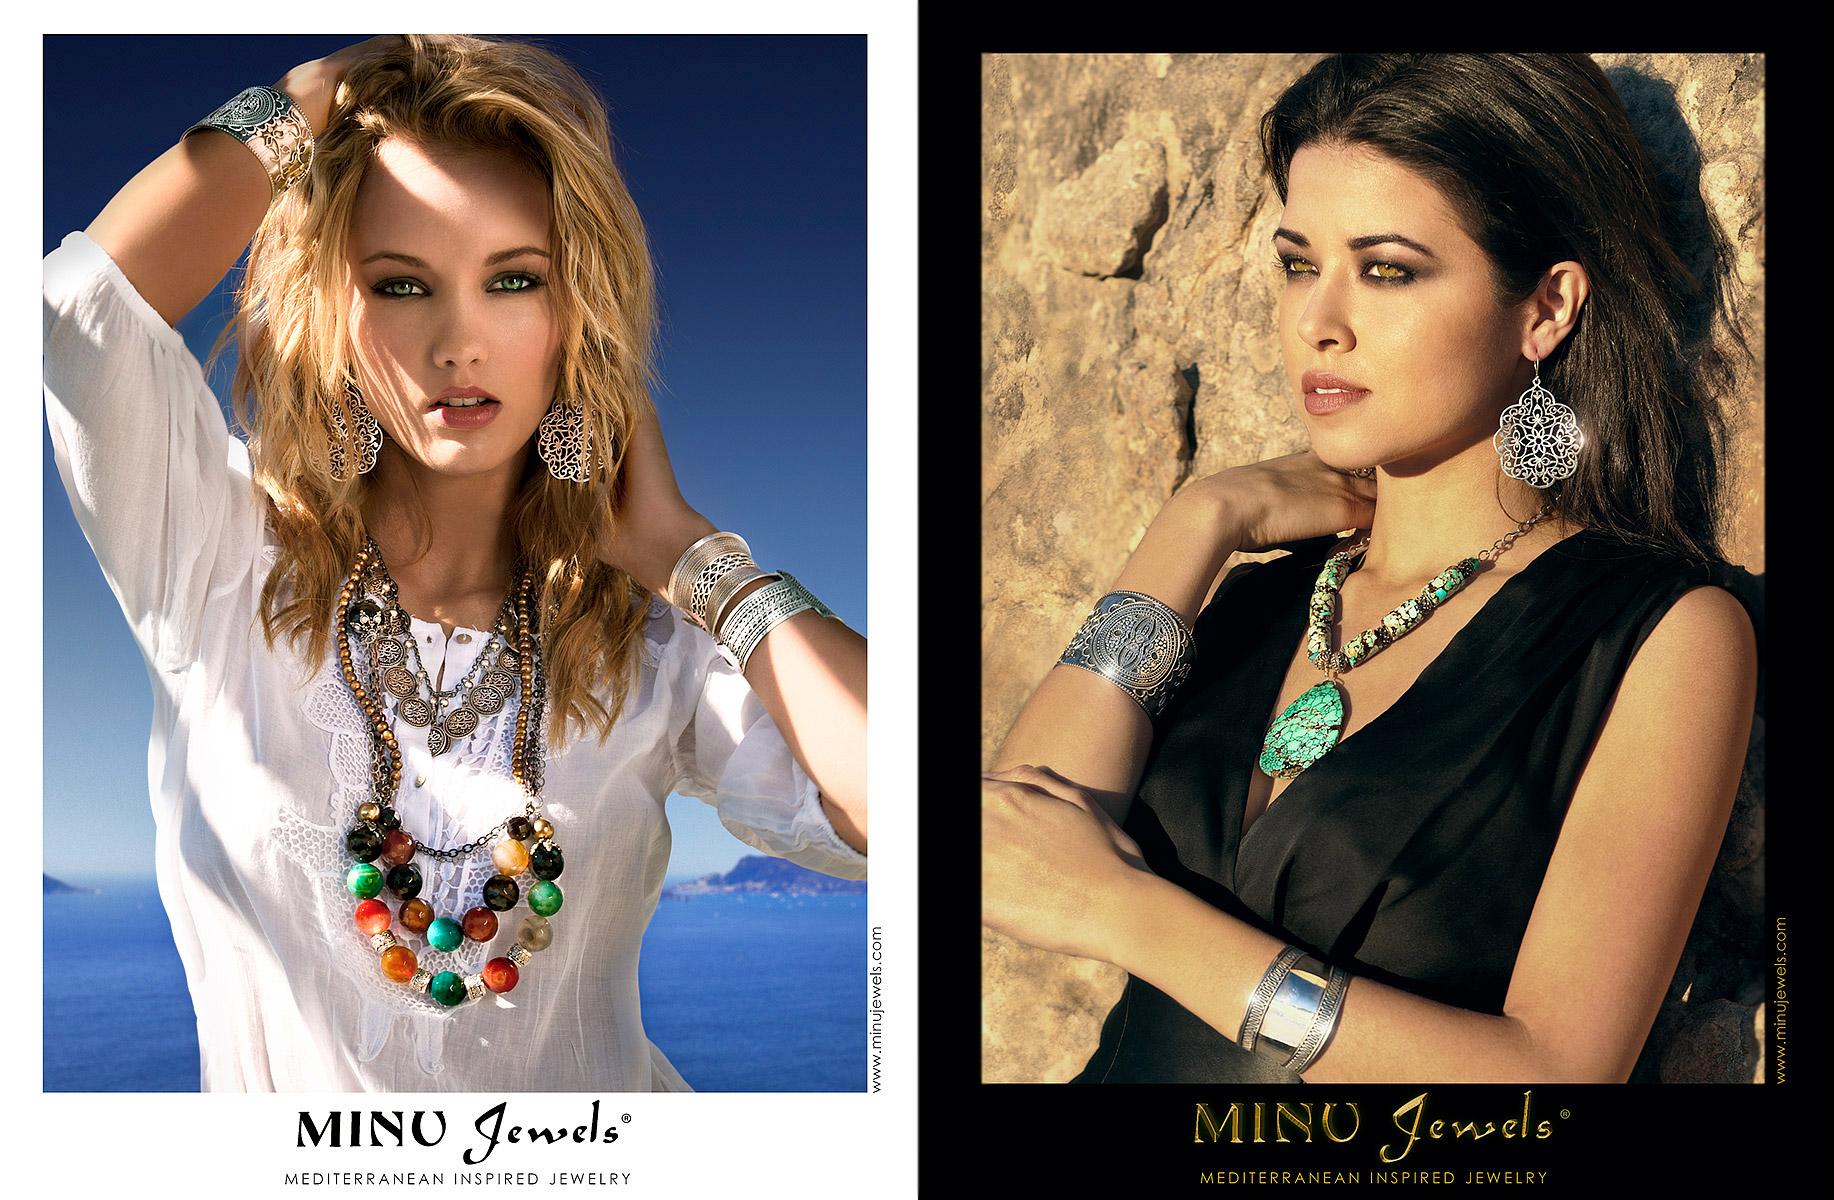 albuquerque-santa-fe-fashion-jewelery-photo-46.jpg